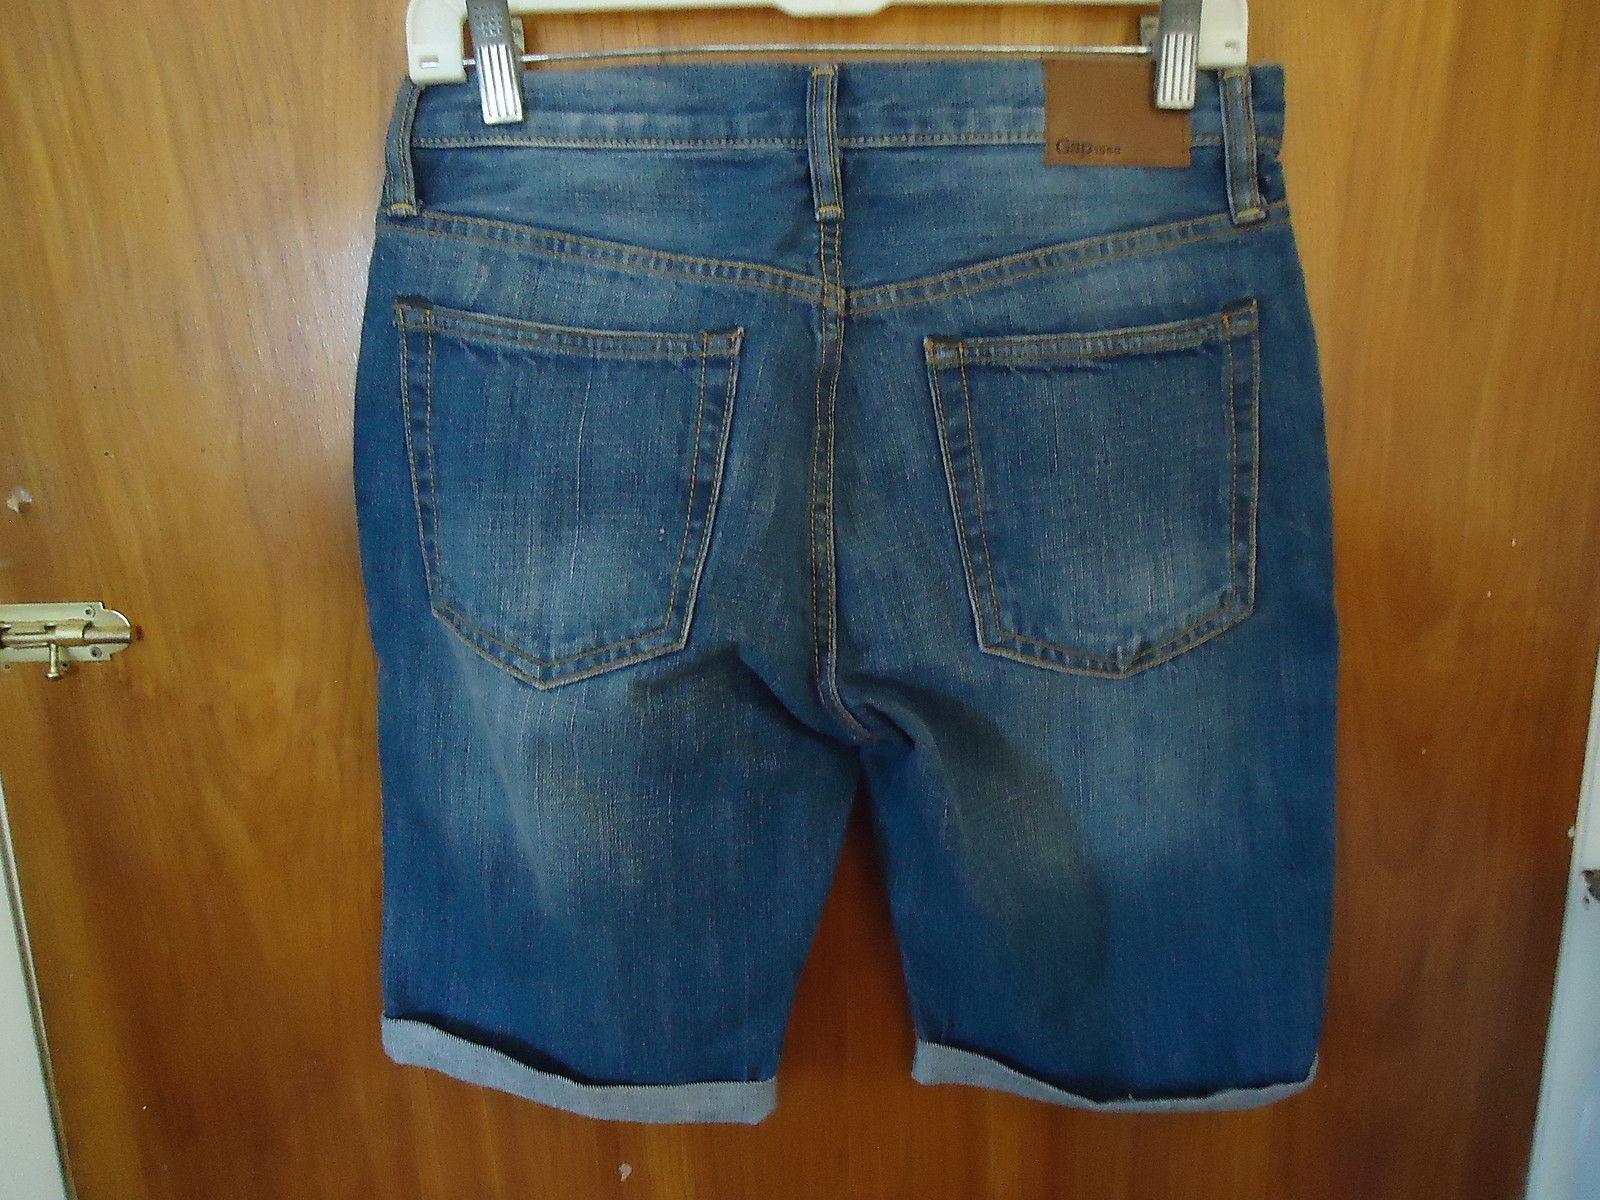 "Gap 1969 Size 29 Slim Jean Shorts "" GREAT PAIR """